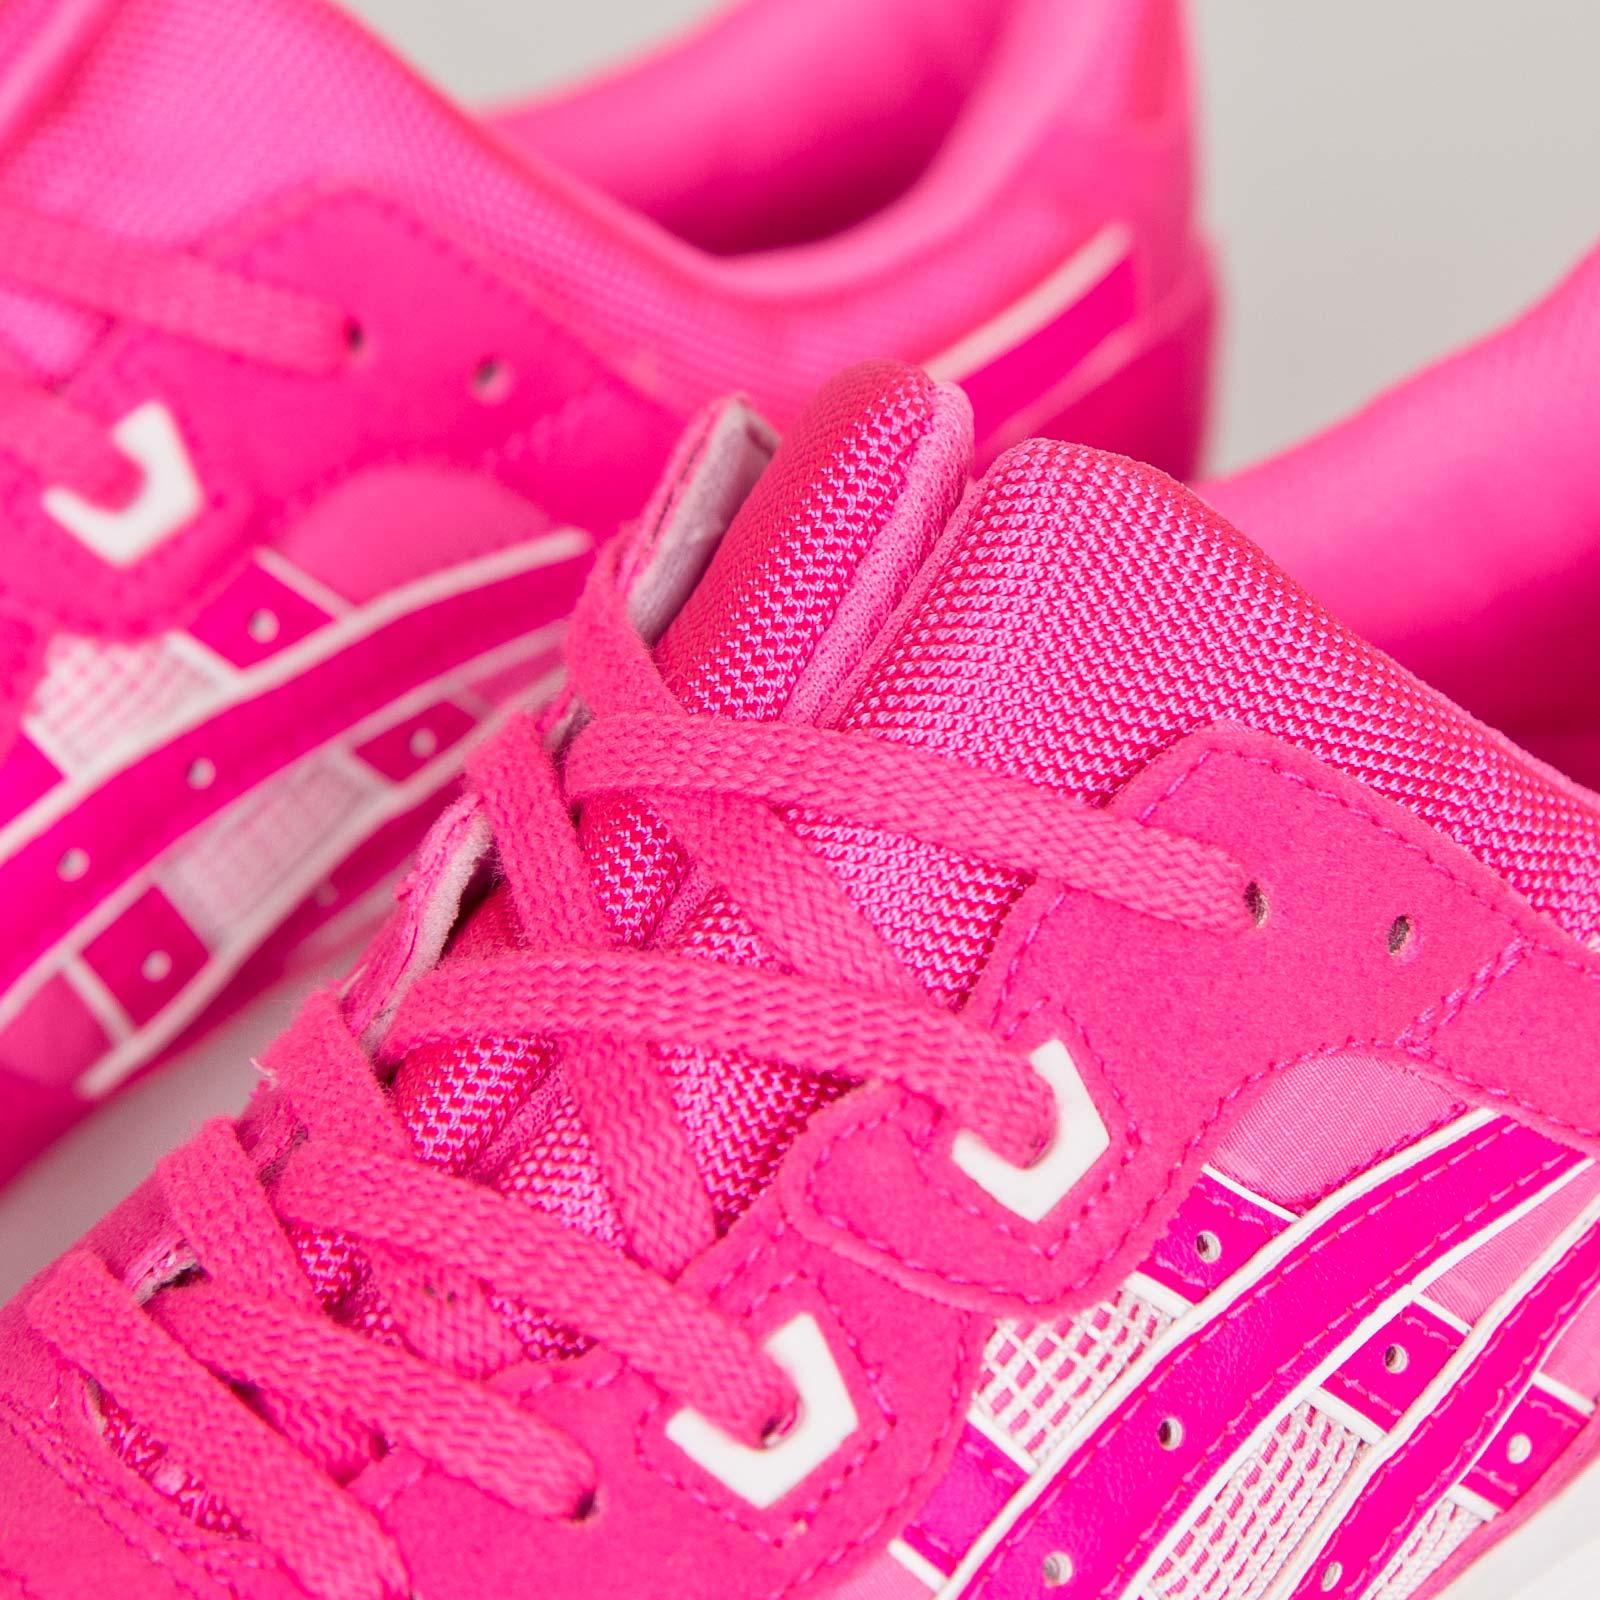 Asics Gel Lyte III Knoutout Pink Rosa Knoutout H520N 2020